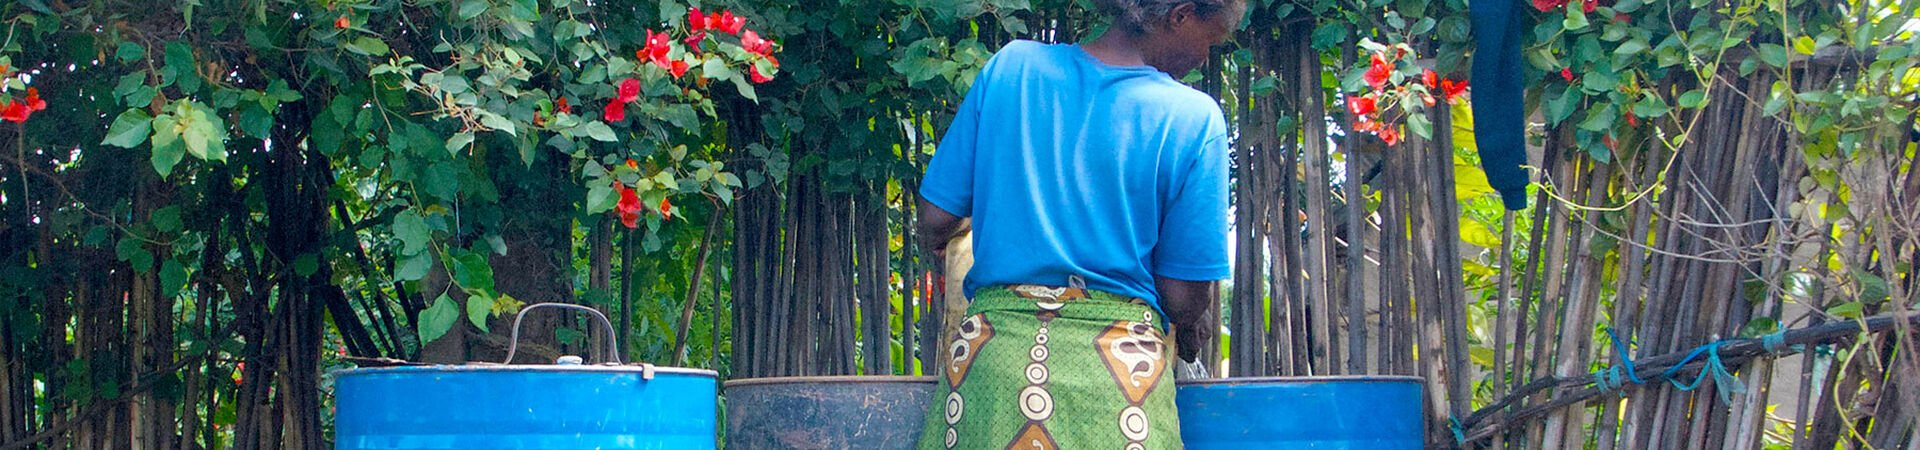 Banner - Saving the Rain in Tanzania